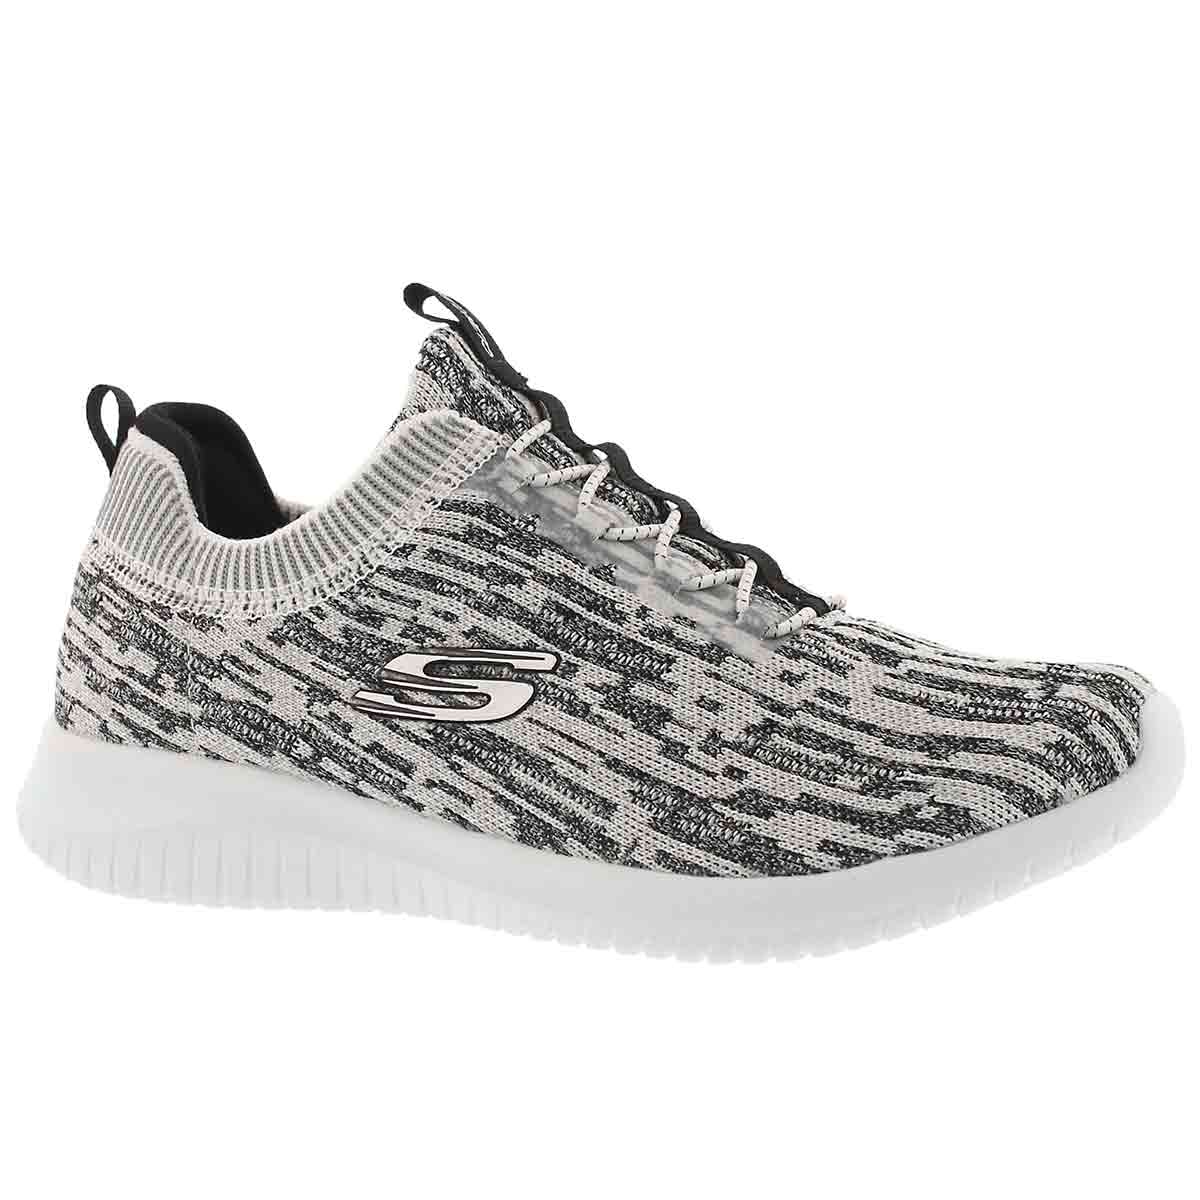 Women's ULTRA FLEX BRIGHT HORIZON wht/bk sneakers